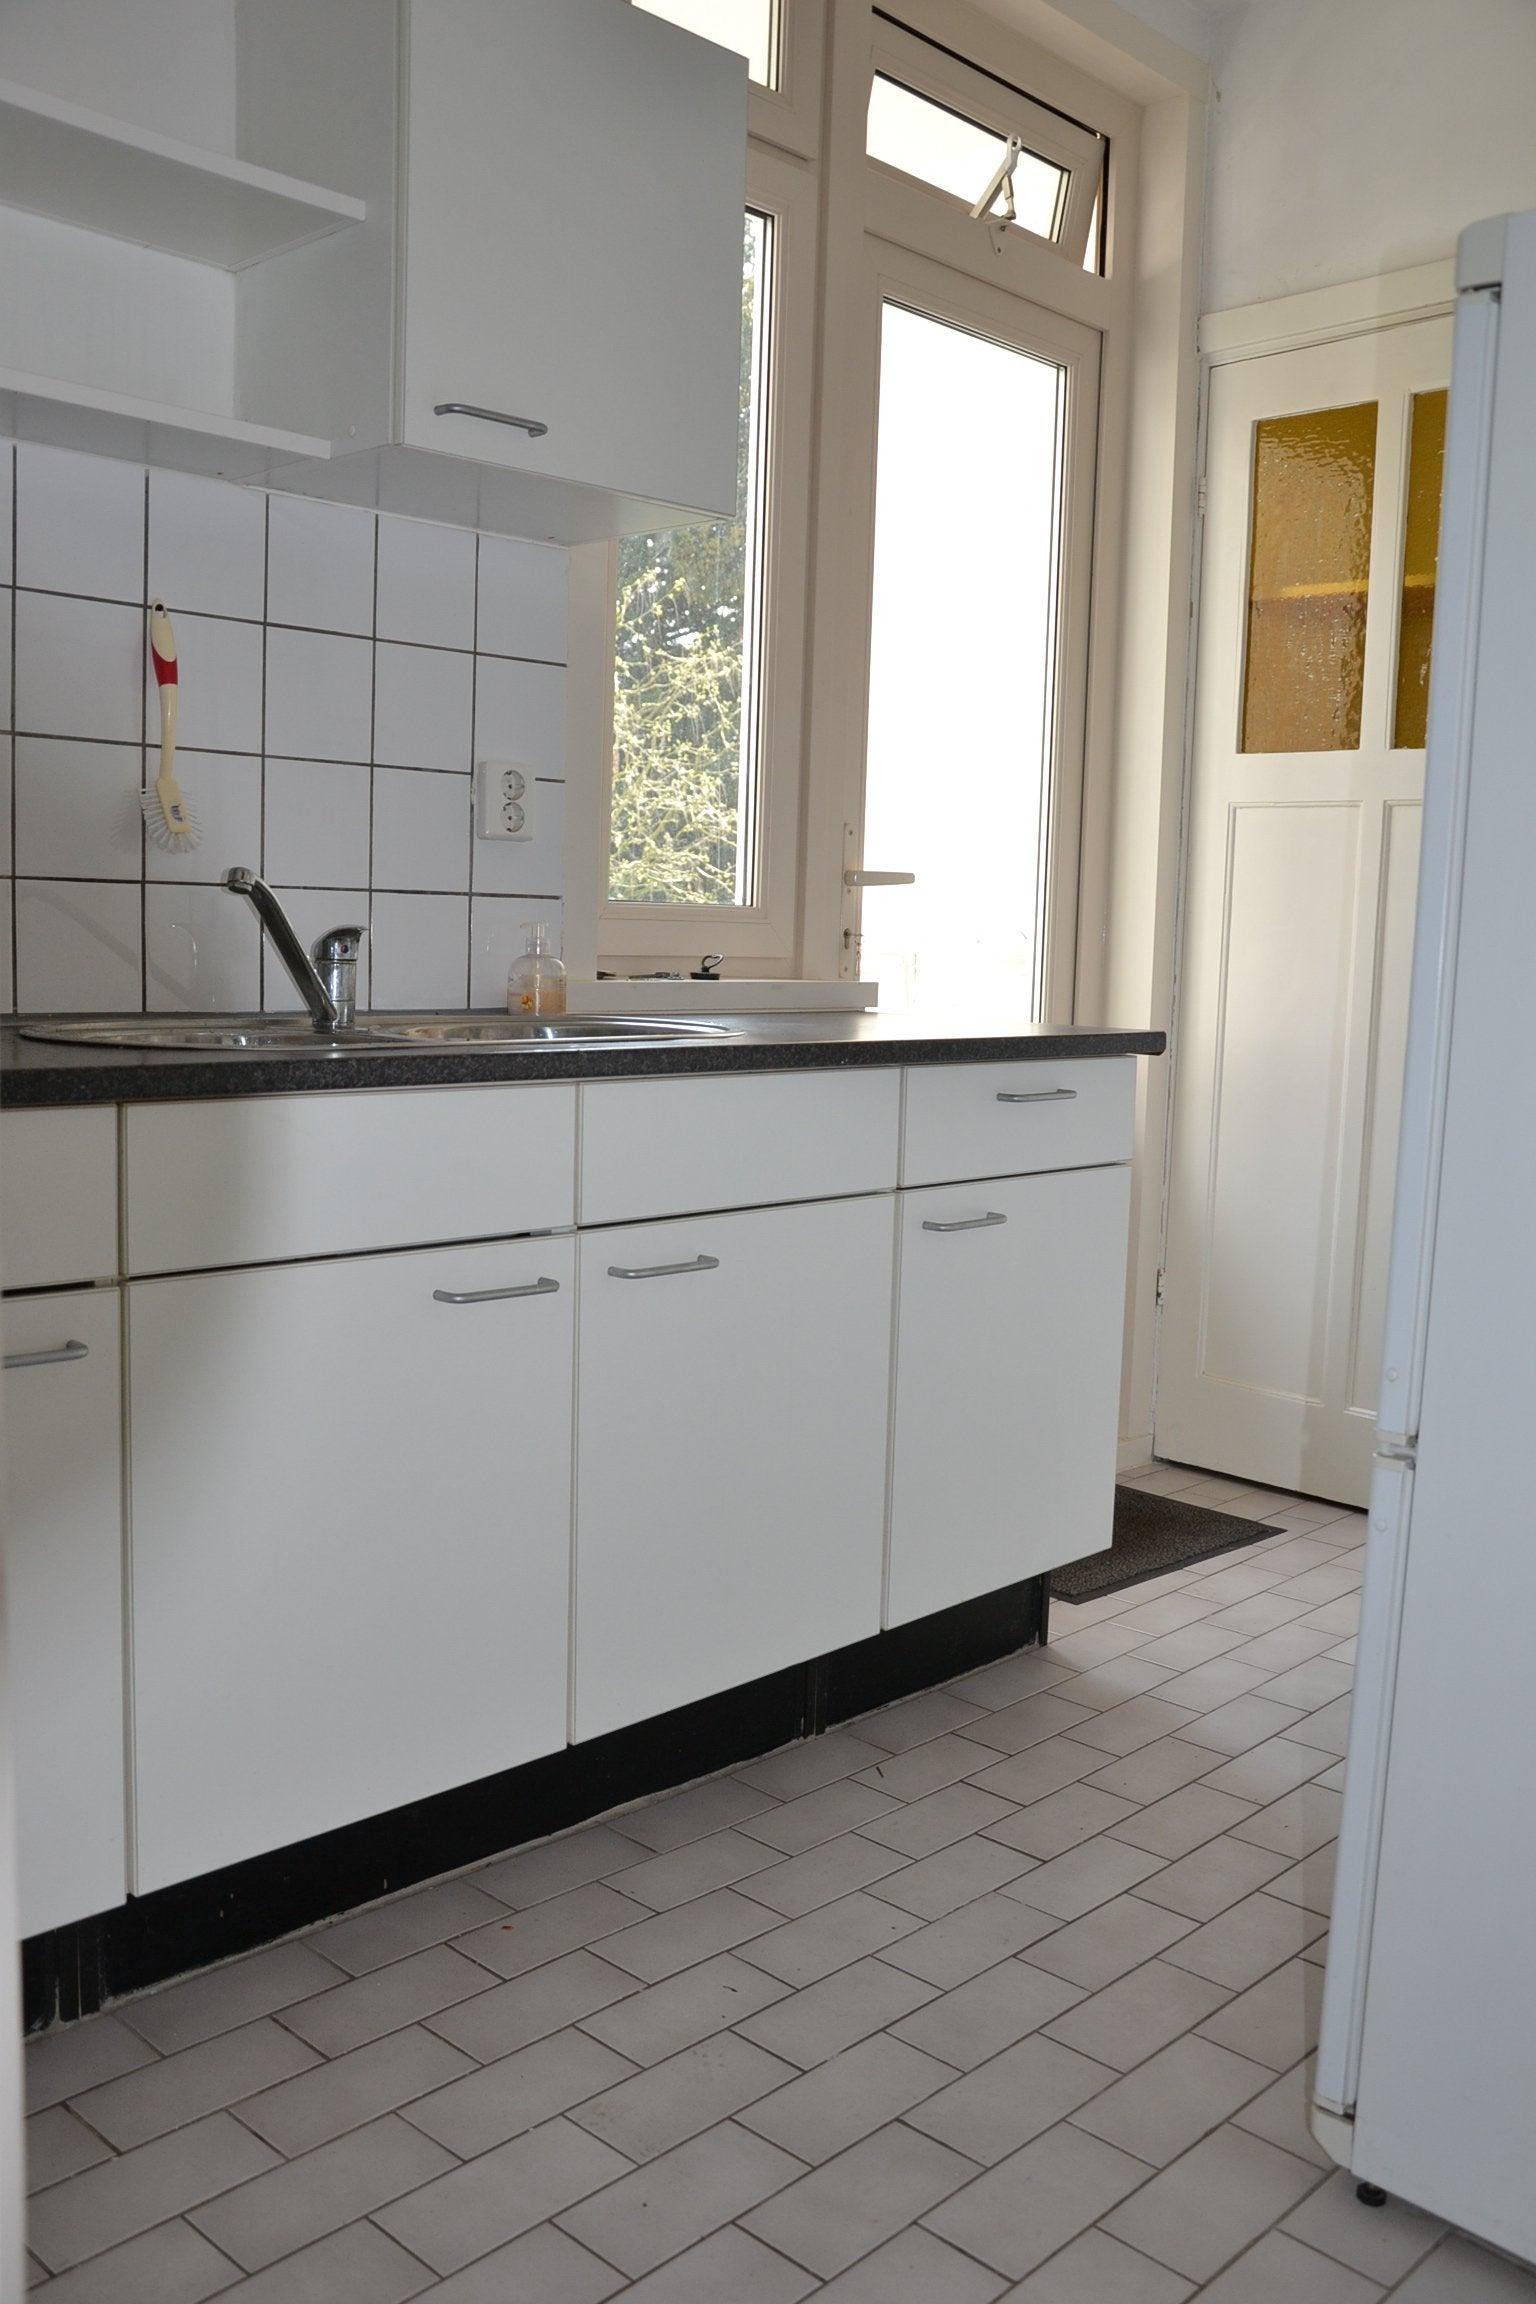 https://public.parariusoffice.nl/185/photos/huge/2778051.1428671355-961.JPG